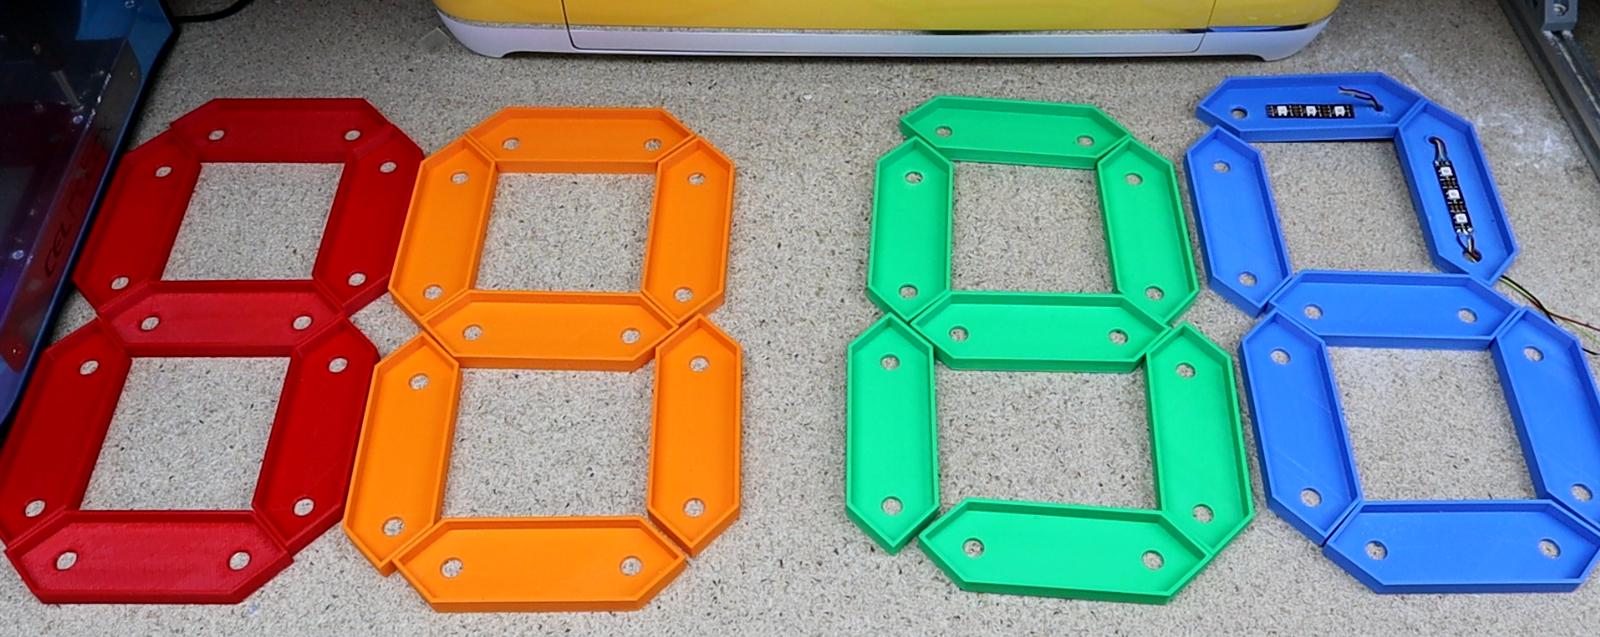 7 segment display RGB LED clock